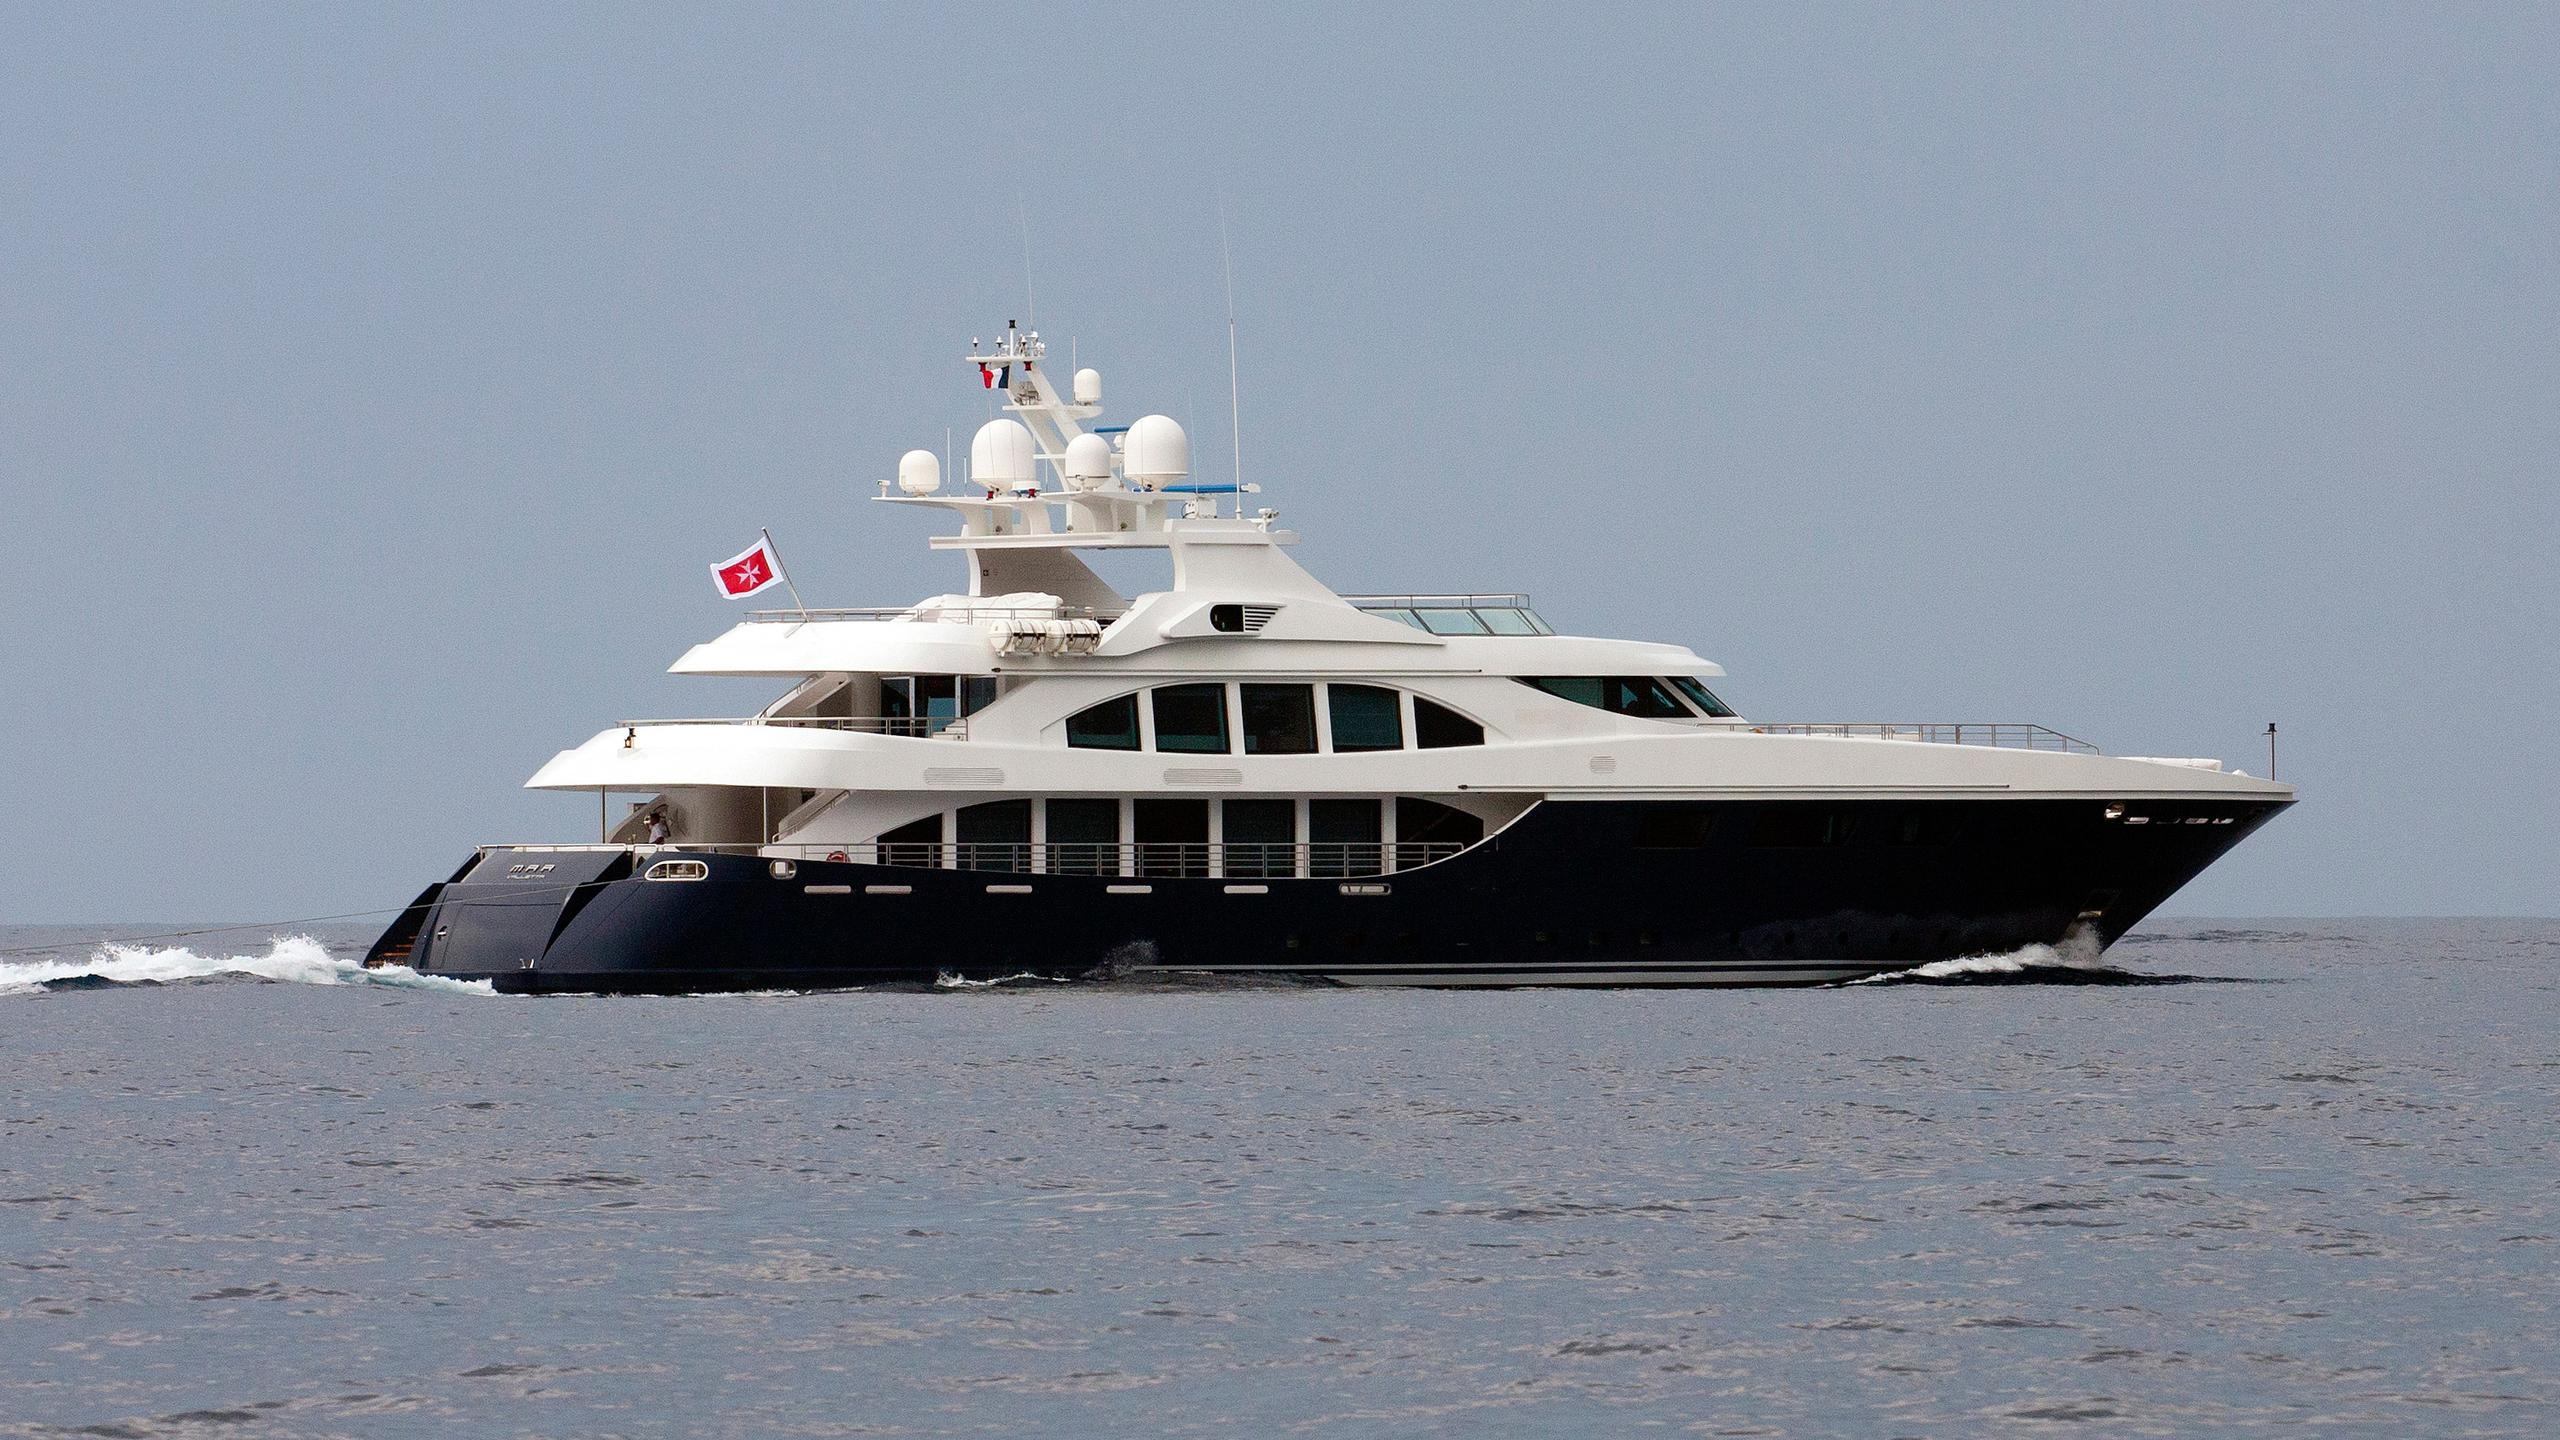 resilience-motor-yacht-ortona-navi-2008-50m-cruising